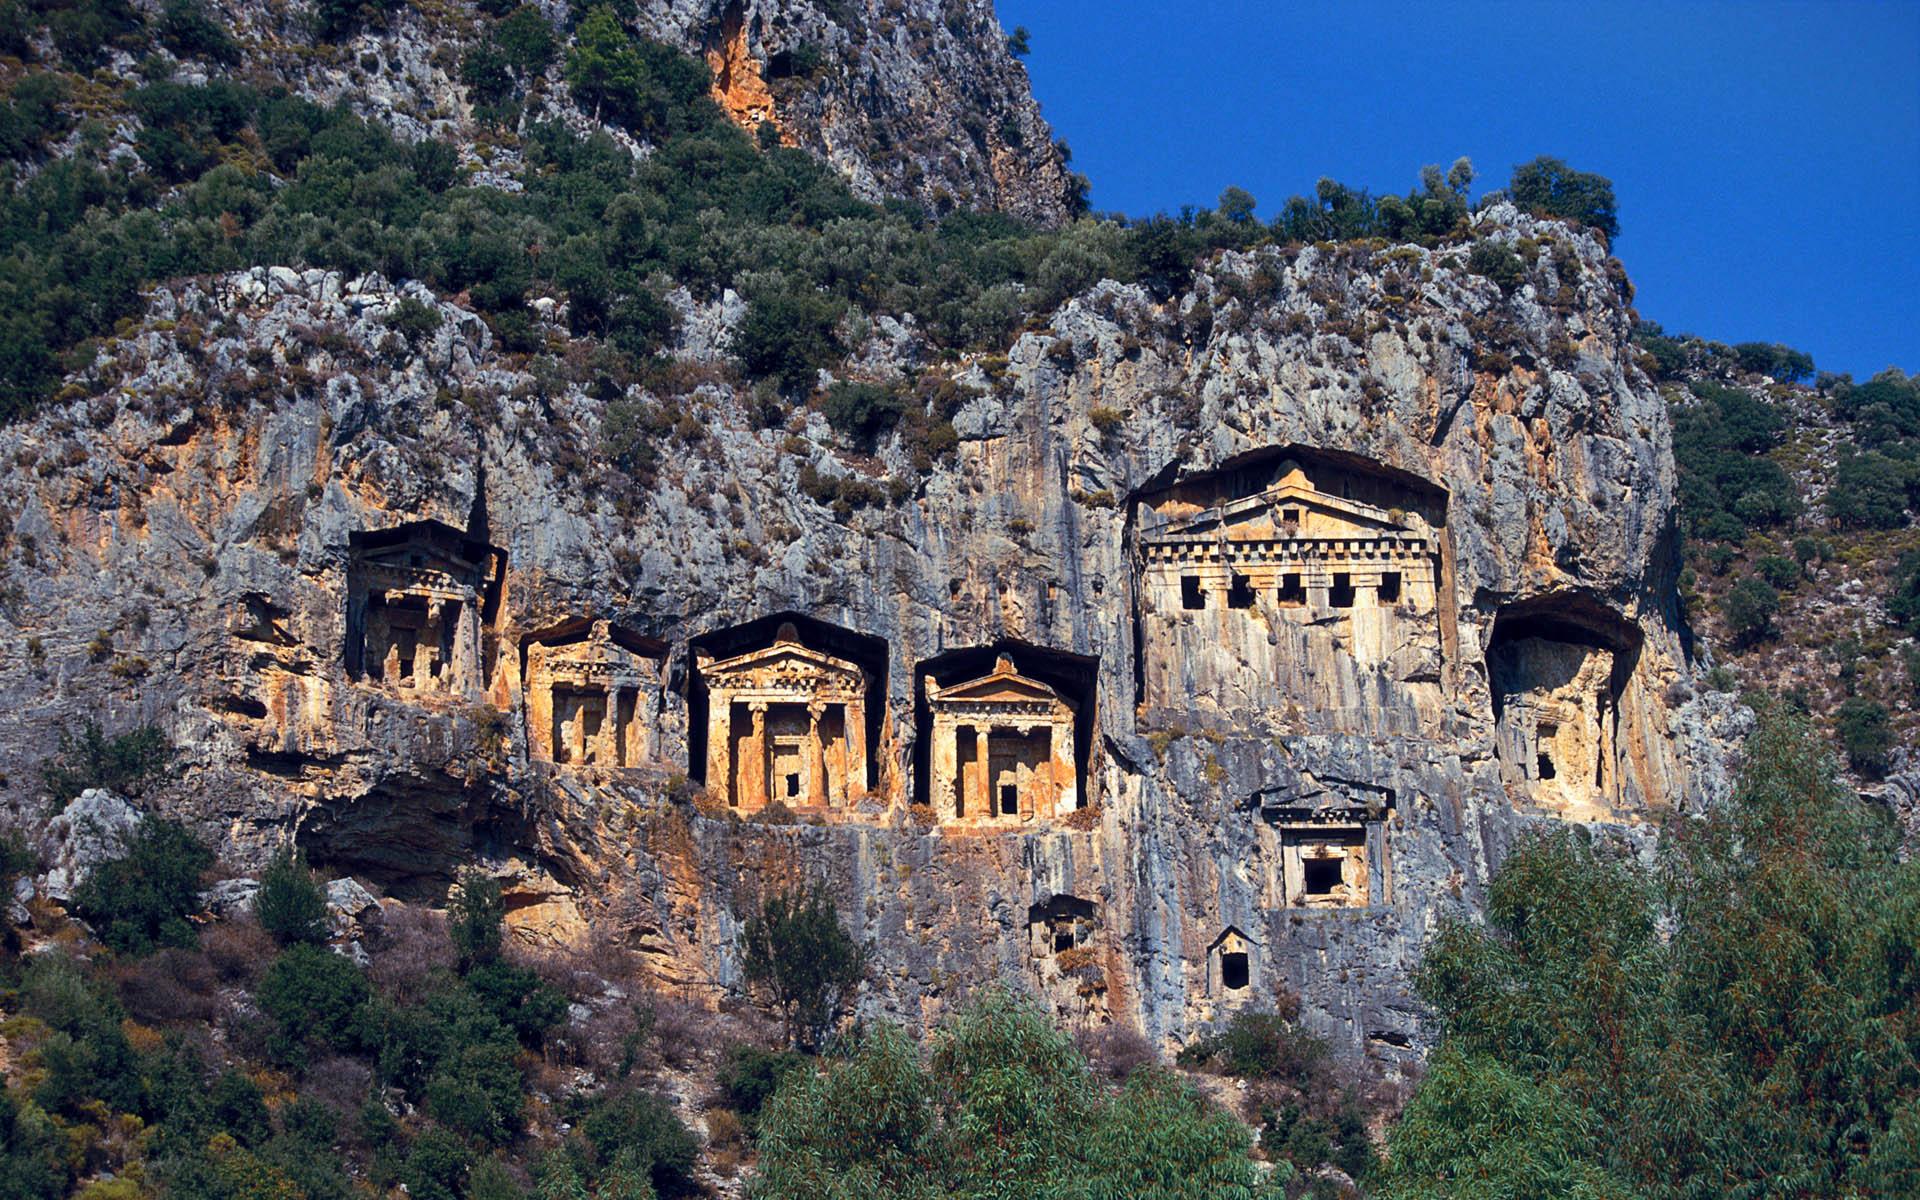 Likya Antik Kaya Mezarlar?, Antalya, Türkiye (Ancient Lycian Rock Tombs, Antalya, Turkey)